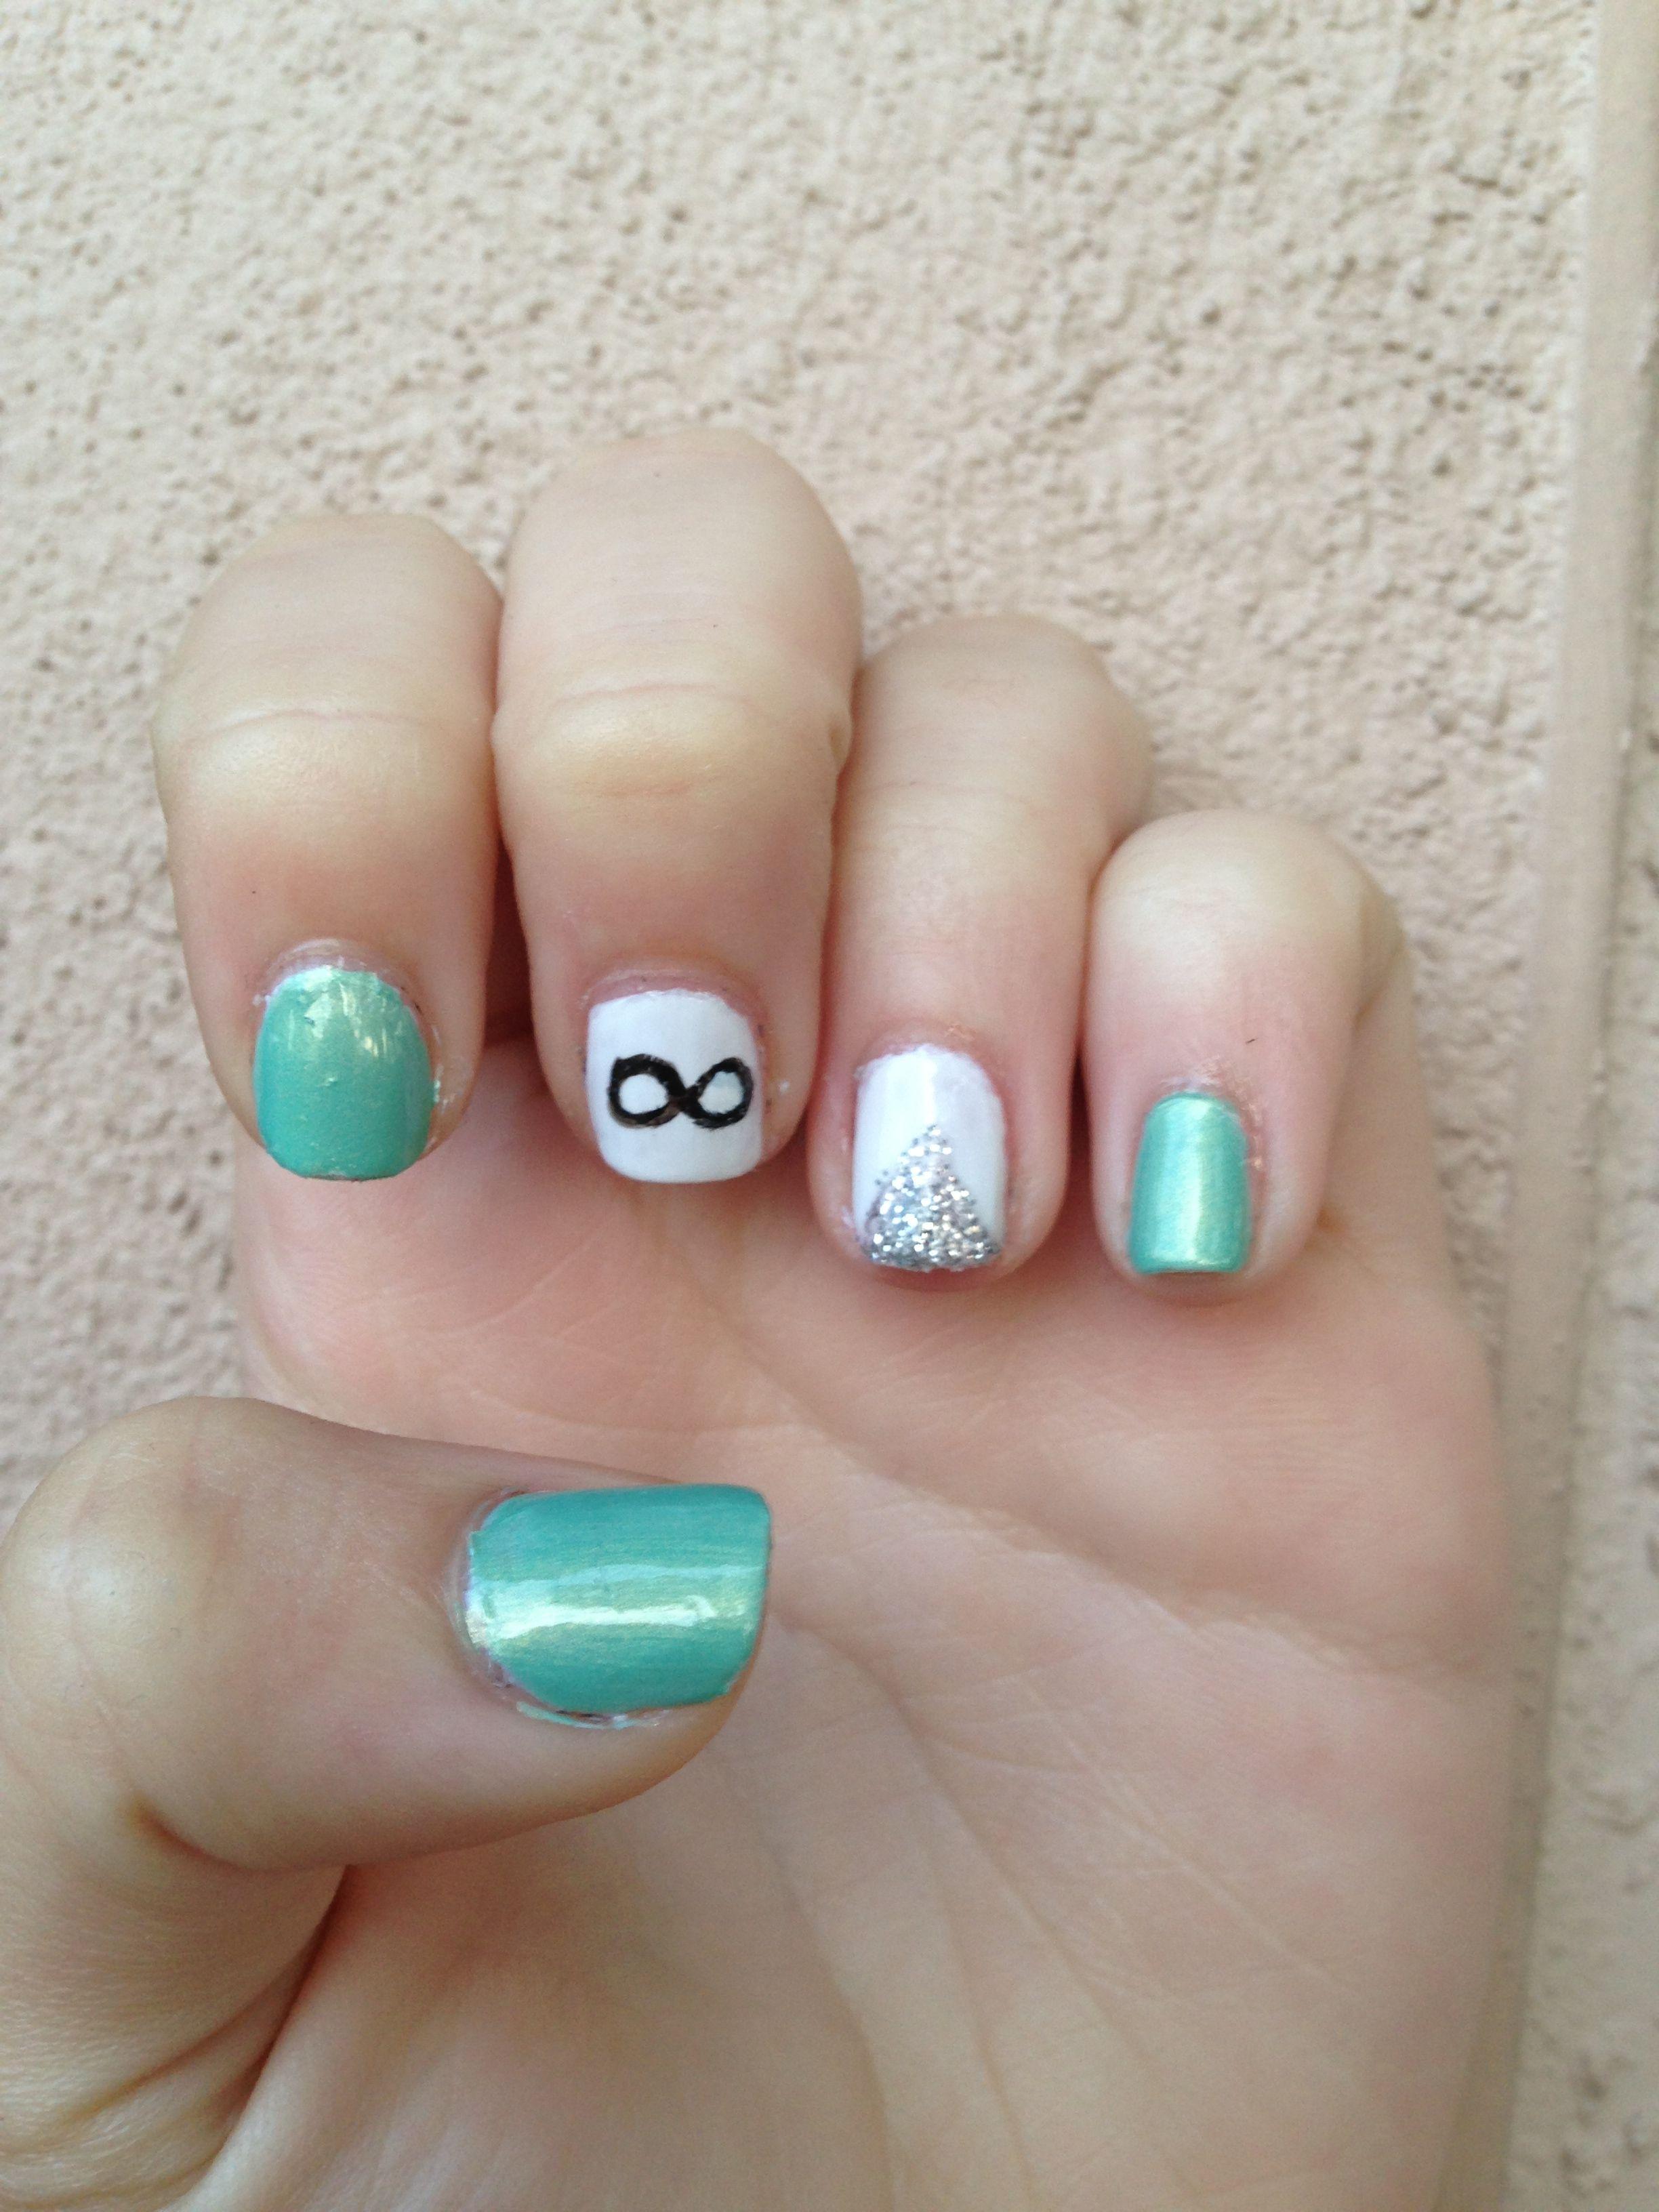 Infinity nail art | Nail Art | Pinterest | Infinity nails, Amazing ...